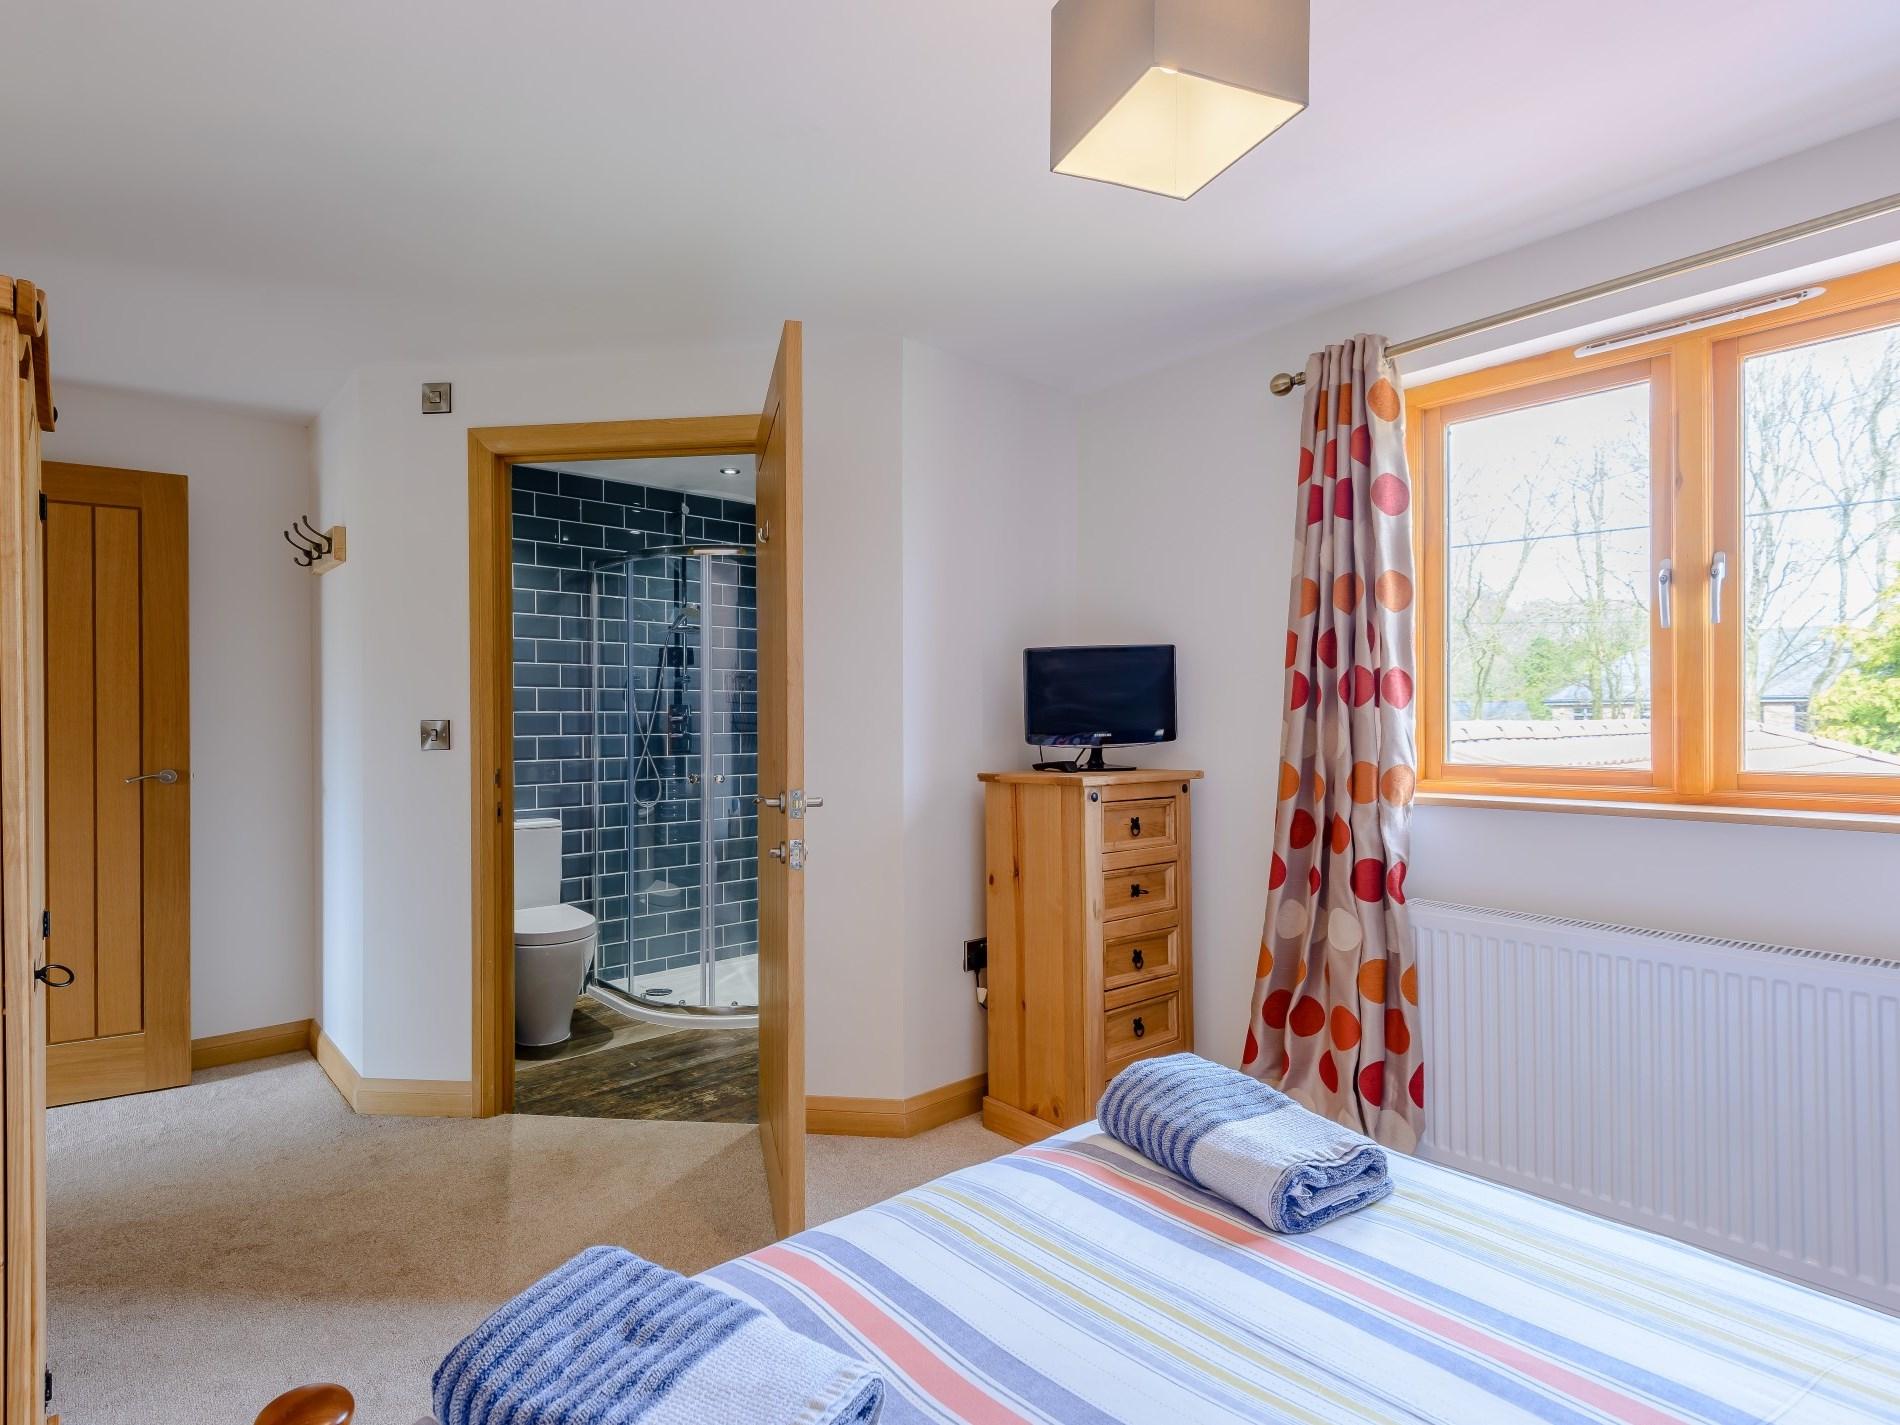 4 Bedroom Cottage in Dorchester, Dorset and Somerset